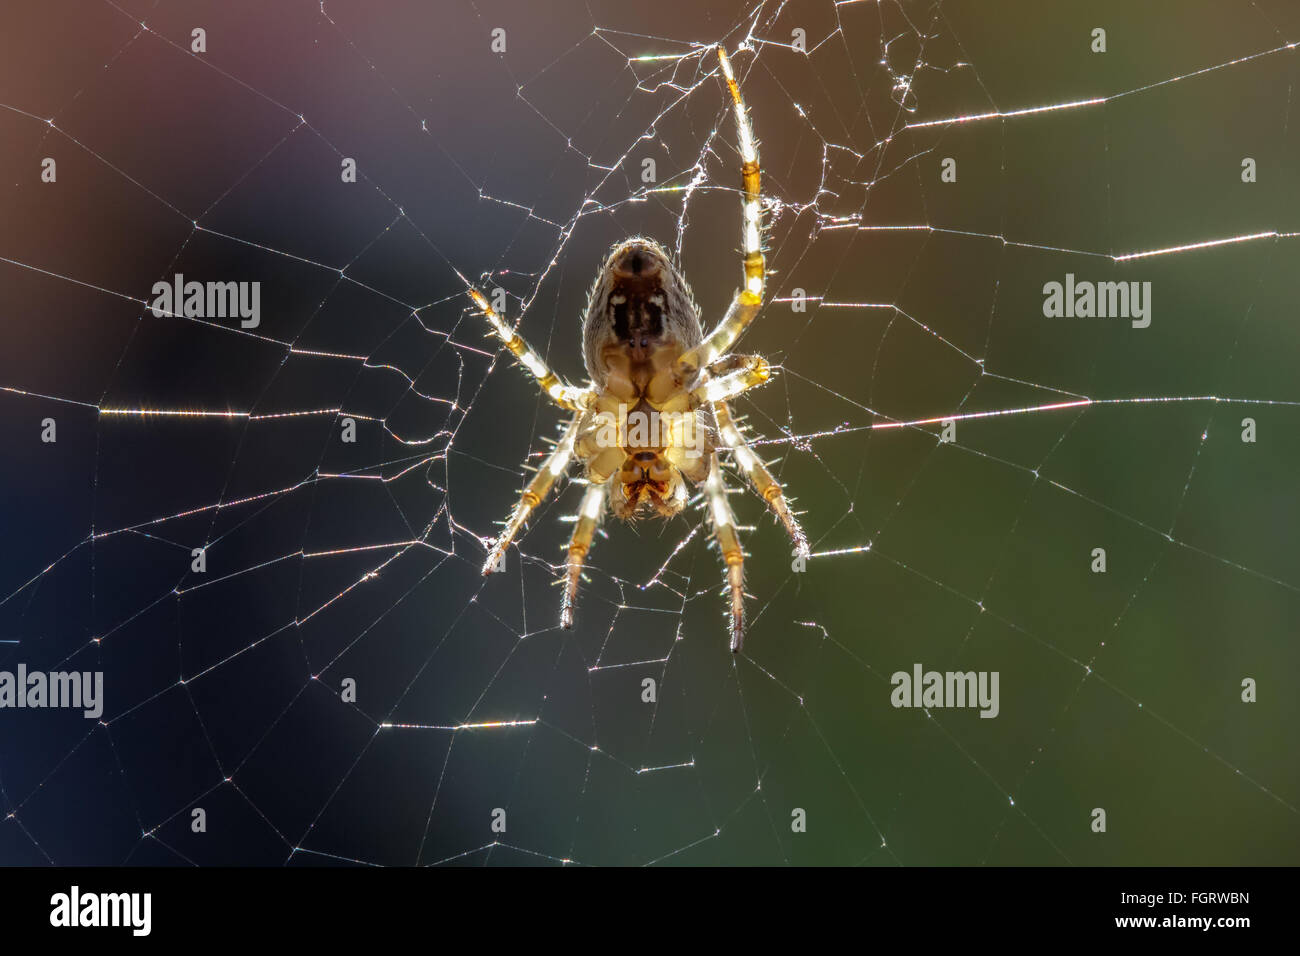 European Garden Spider (Araneus diadematus) waiting for prey to get caught in its web. - Stock Image